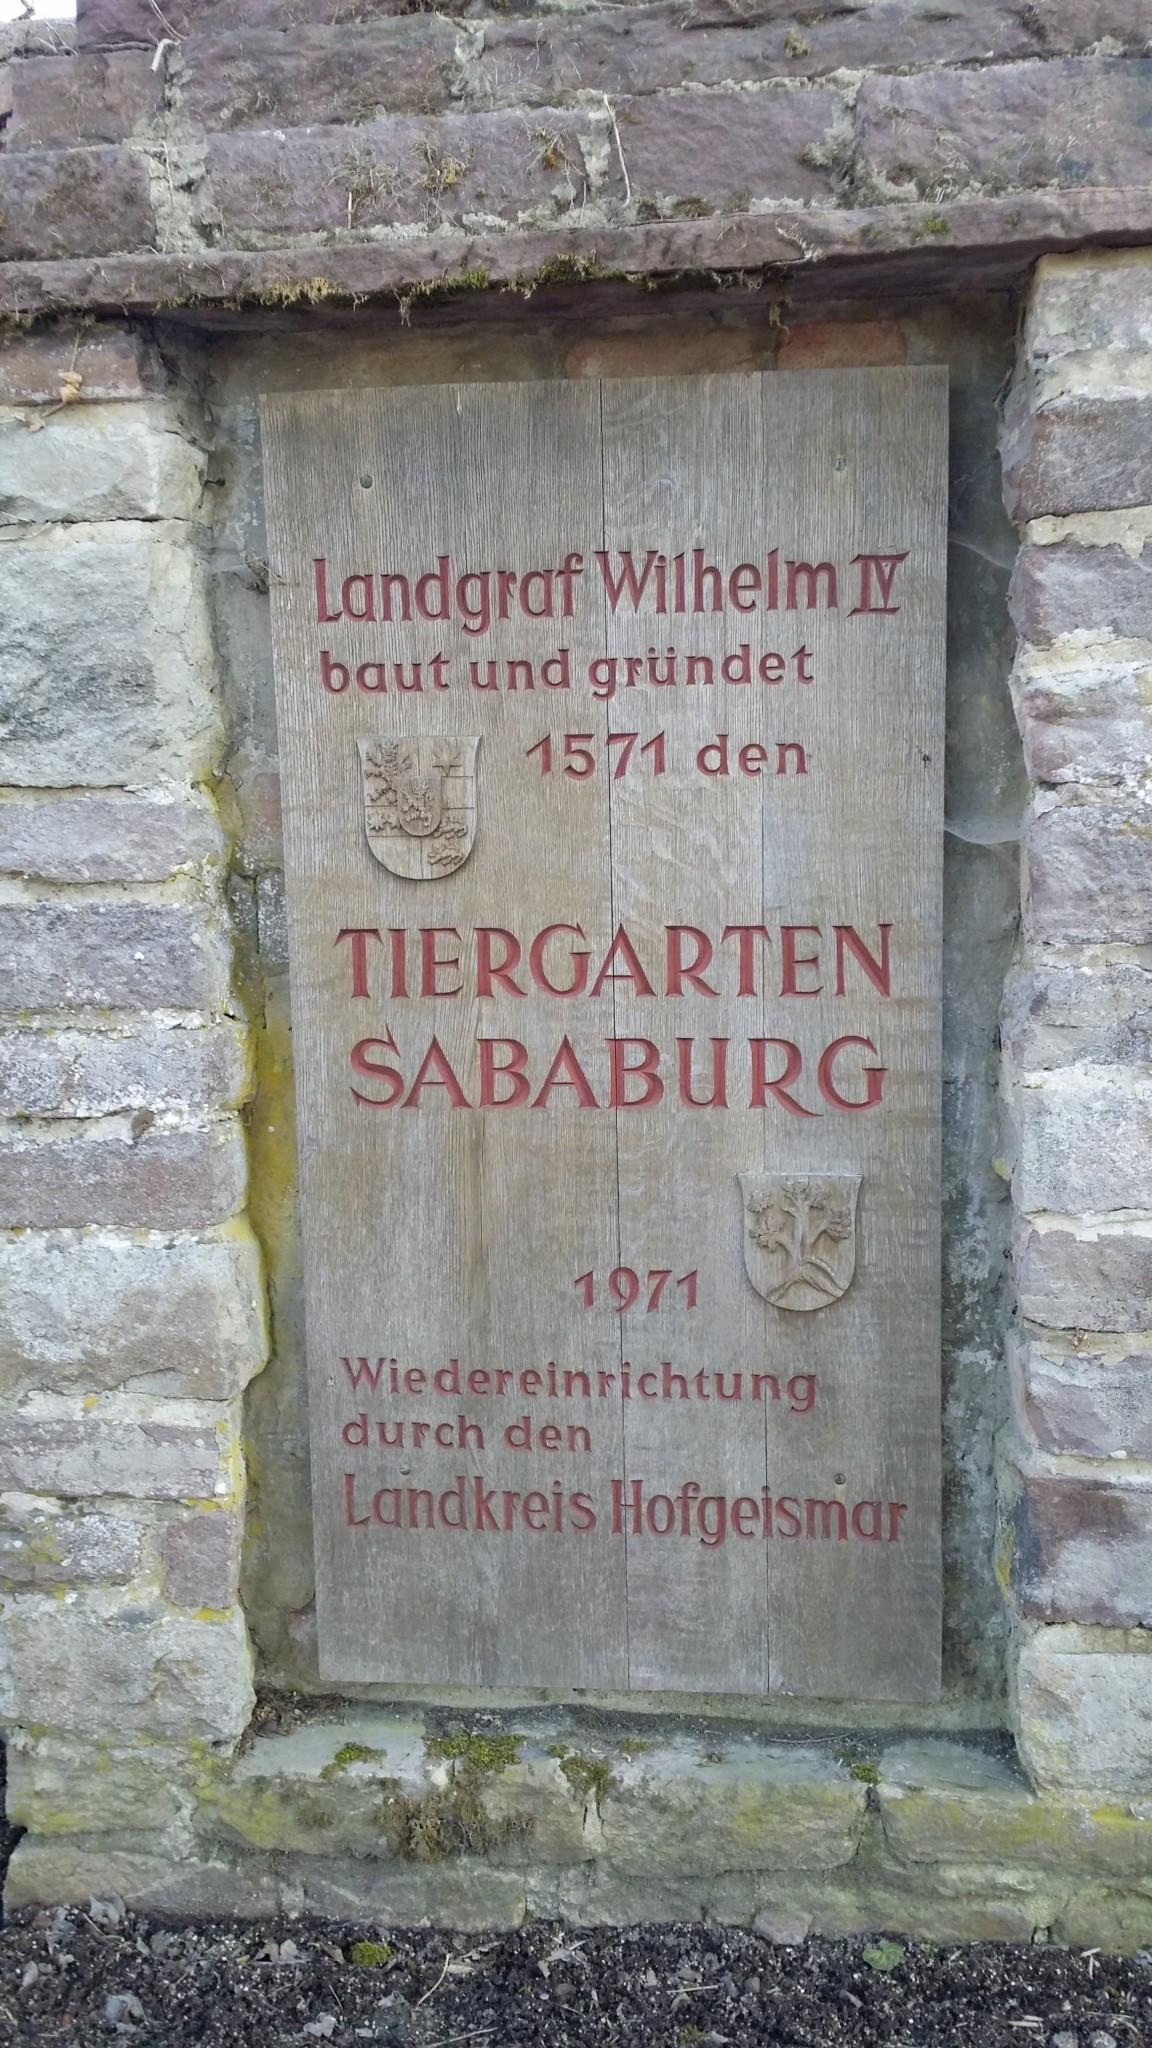 Tiergarten Sababurg